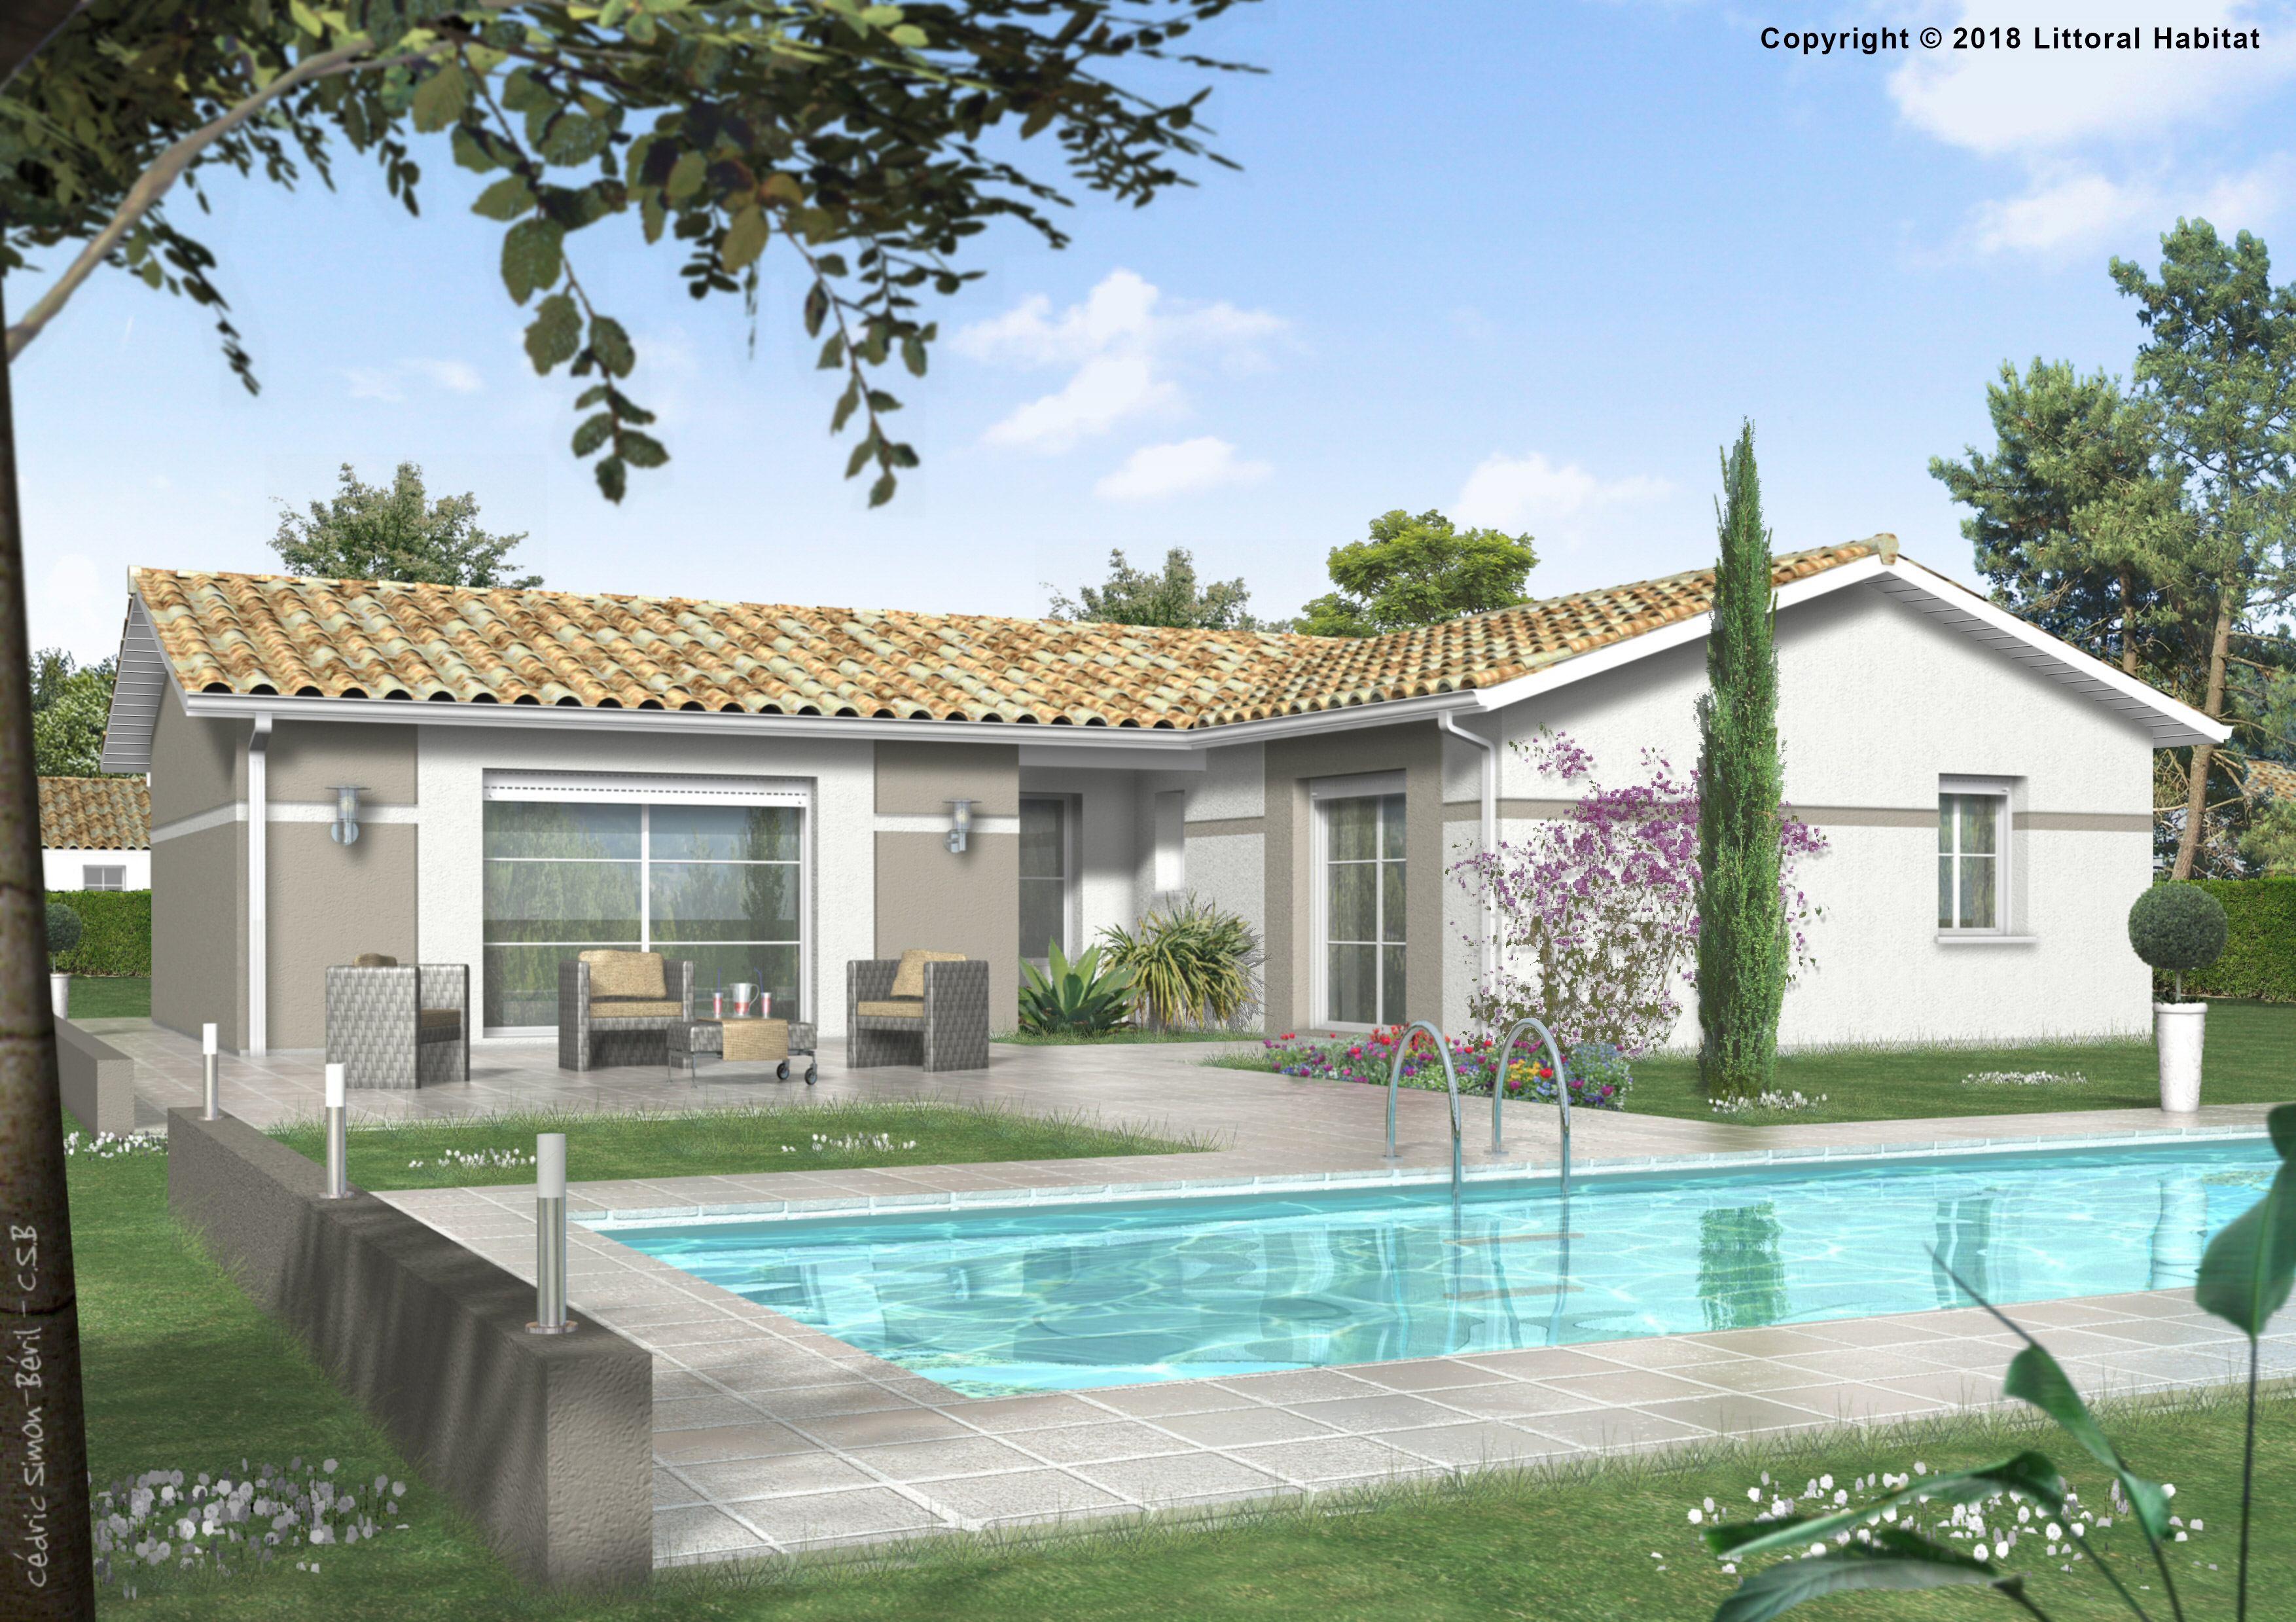 Maisons + Terrains du constructeur LITTORAL HABITAT DAX • 86 m² • CASSEN